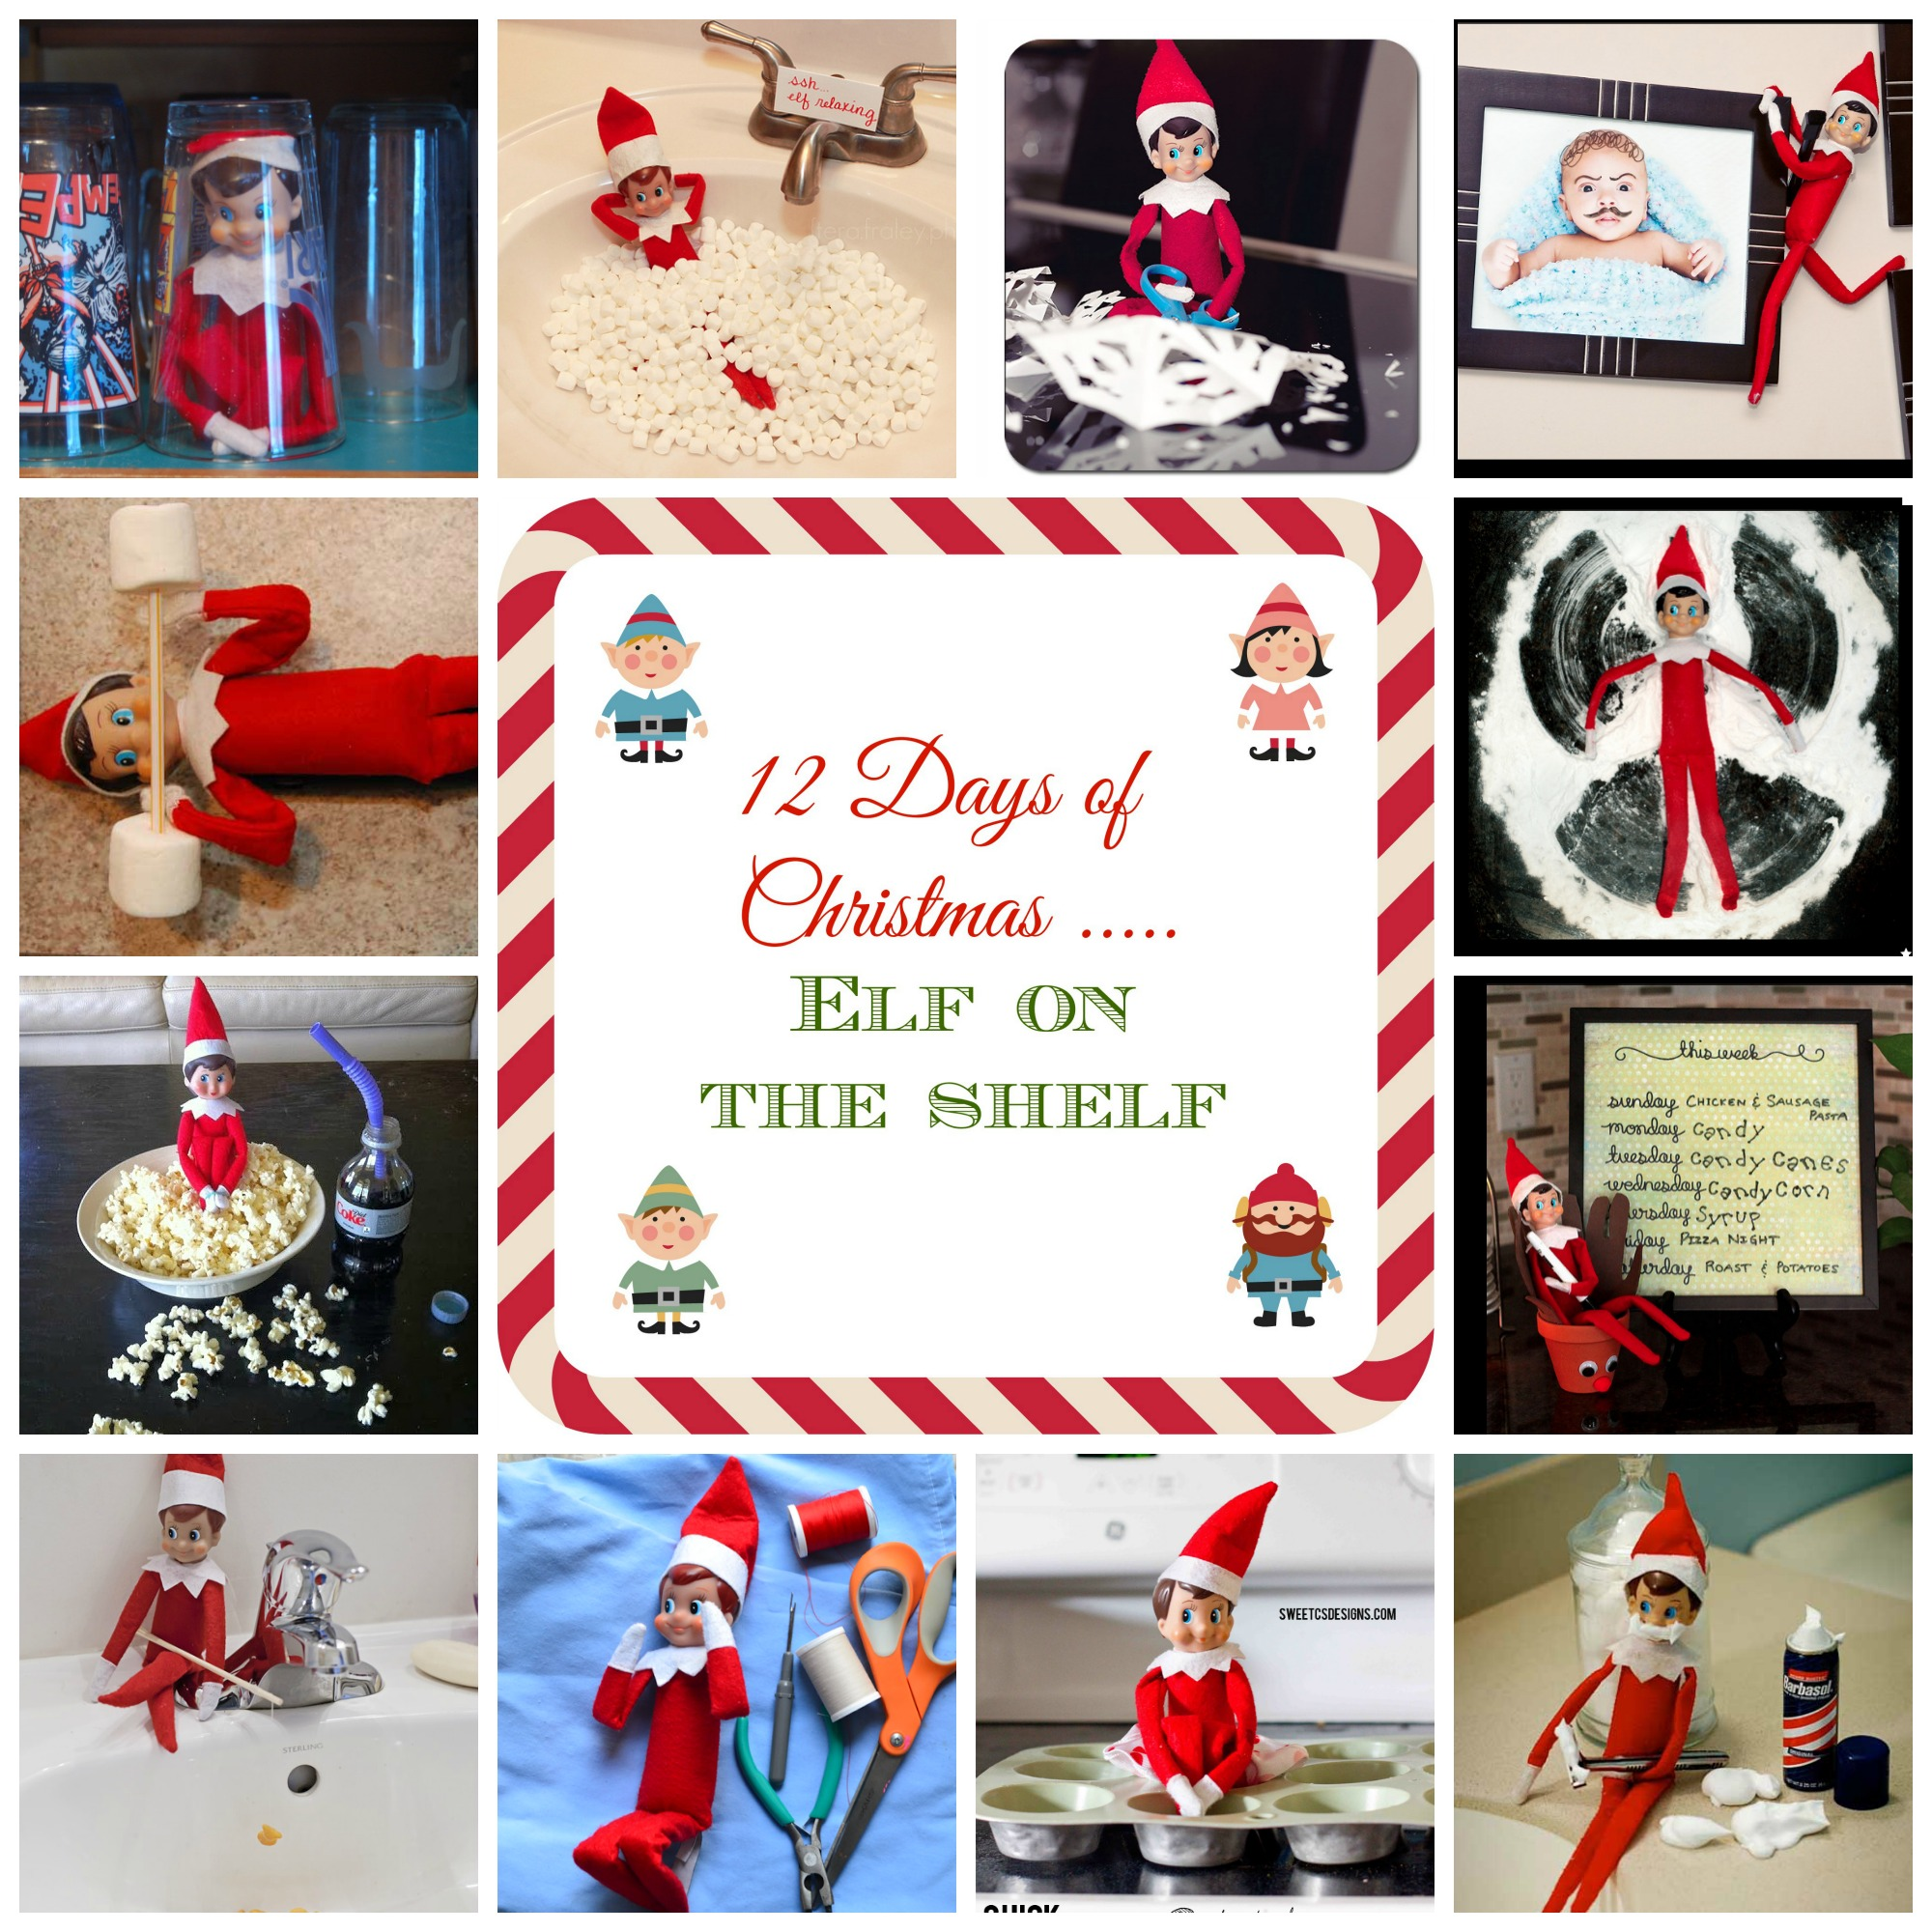 12 Days of Christmas - Elf on the Shelf Ideas